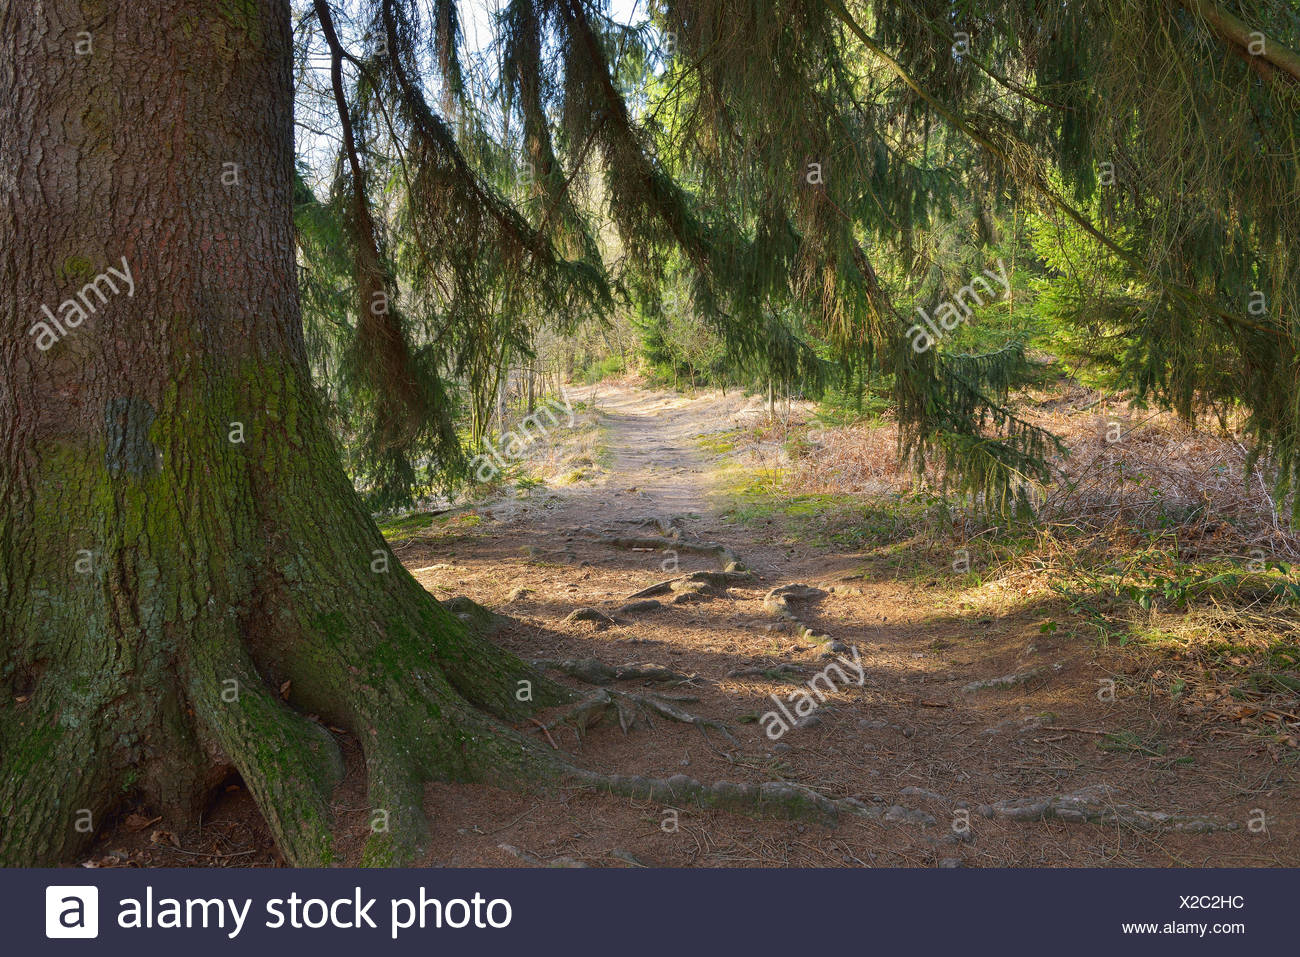 Conifer Tree with Path, Urwald Sababurg, Hofgeismar, Reinhardswald, Hesse, Germany - Stock Image